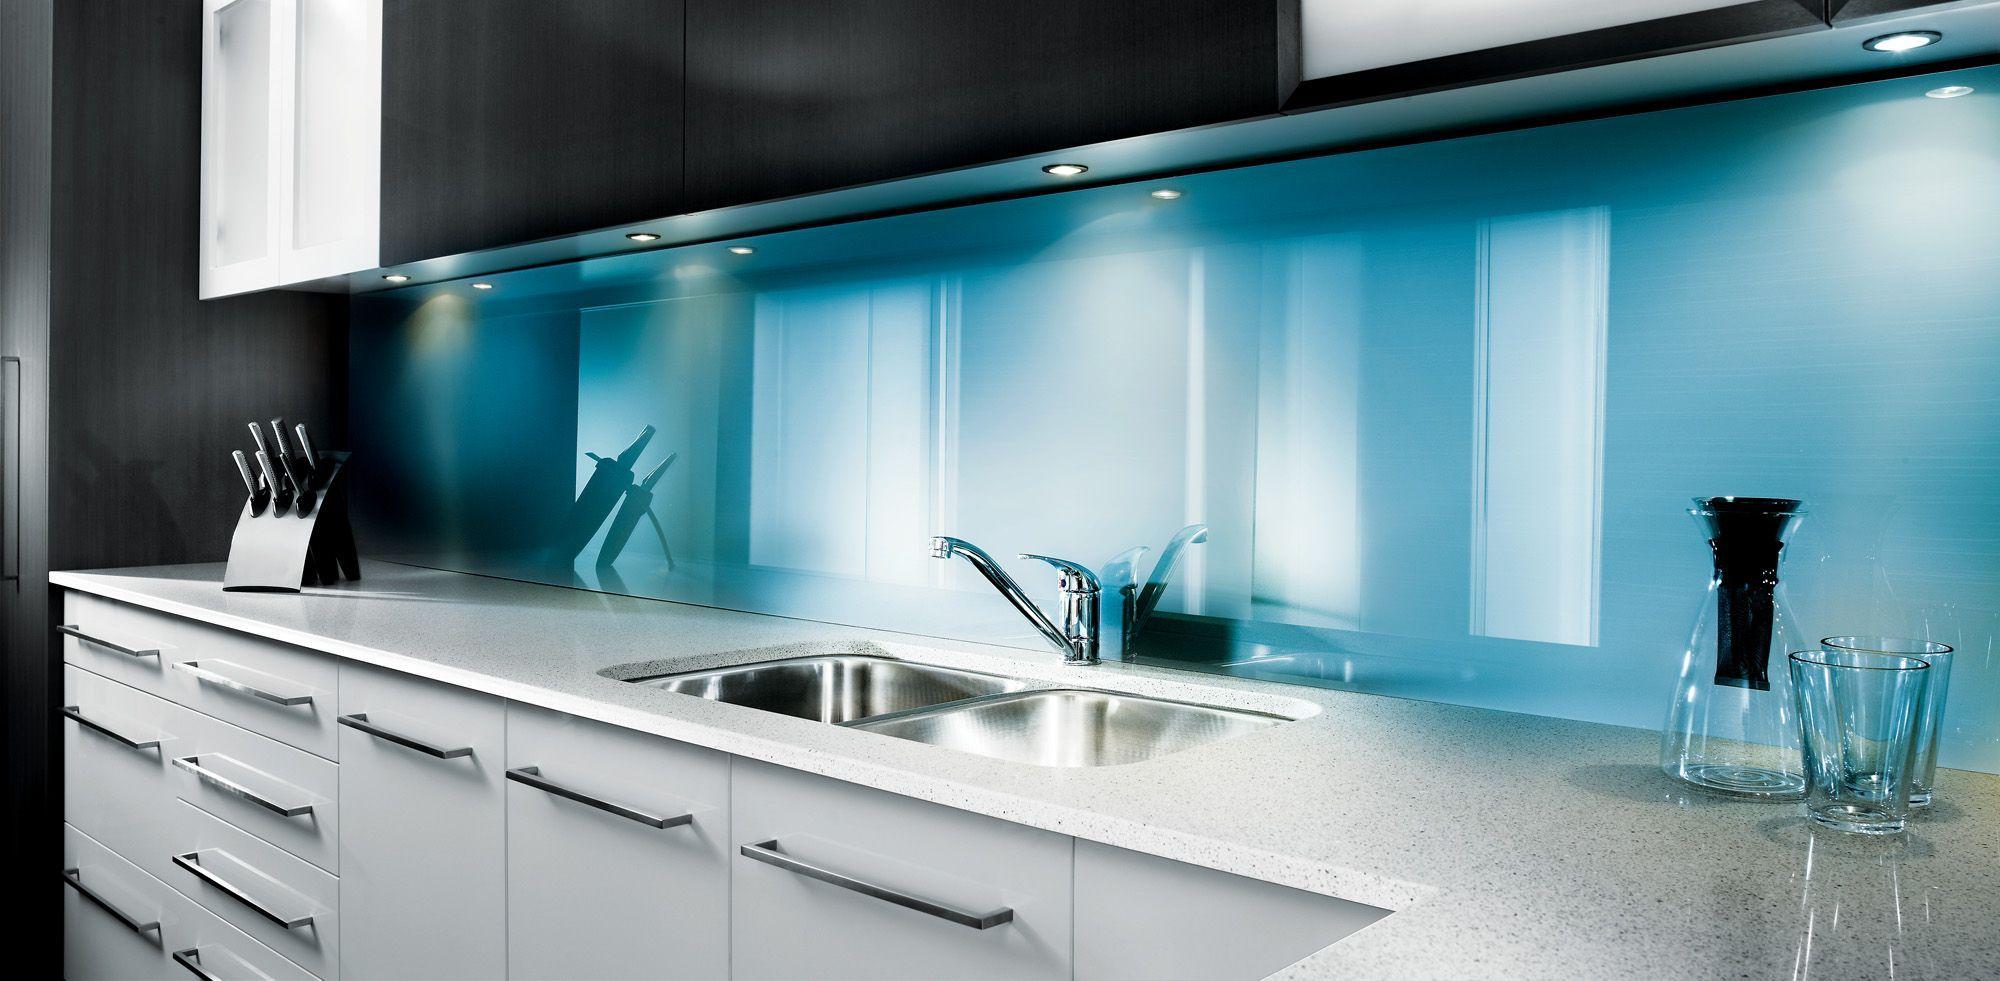 Glass Splashbacks Bathroom Walls Lustrolite Blue Atoll Wall Panels Acrylic Can Fit Over Tiles